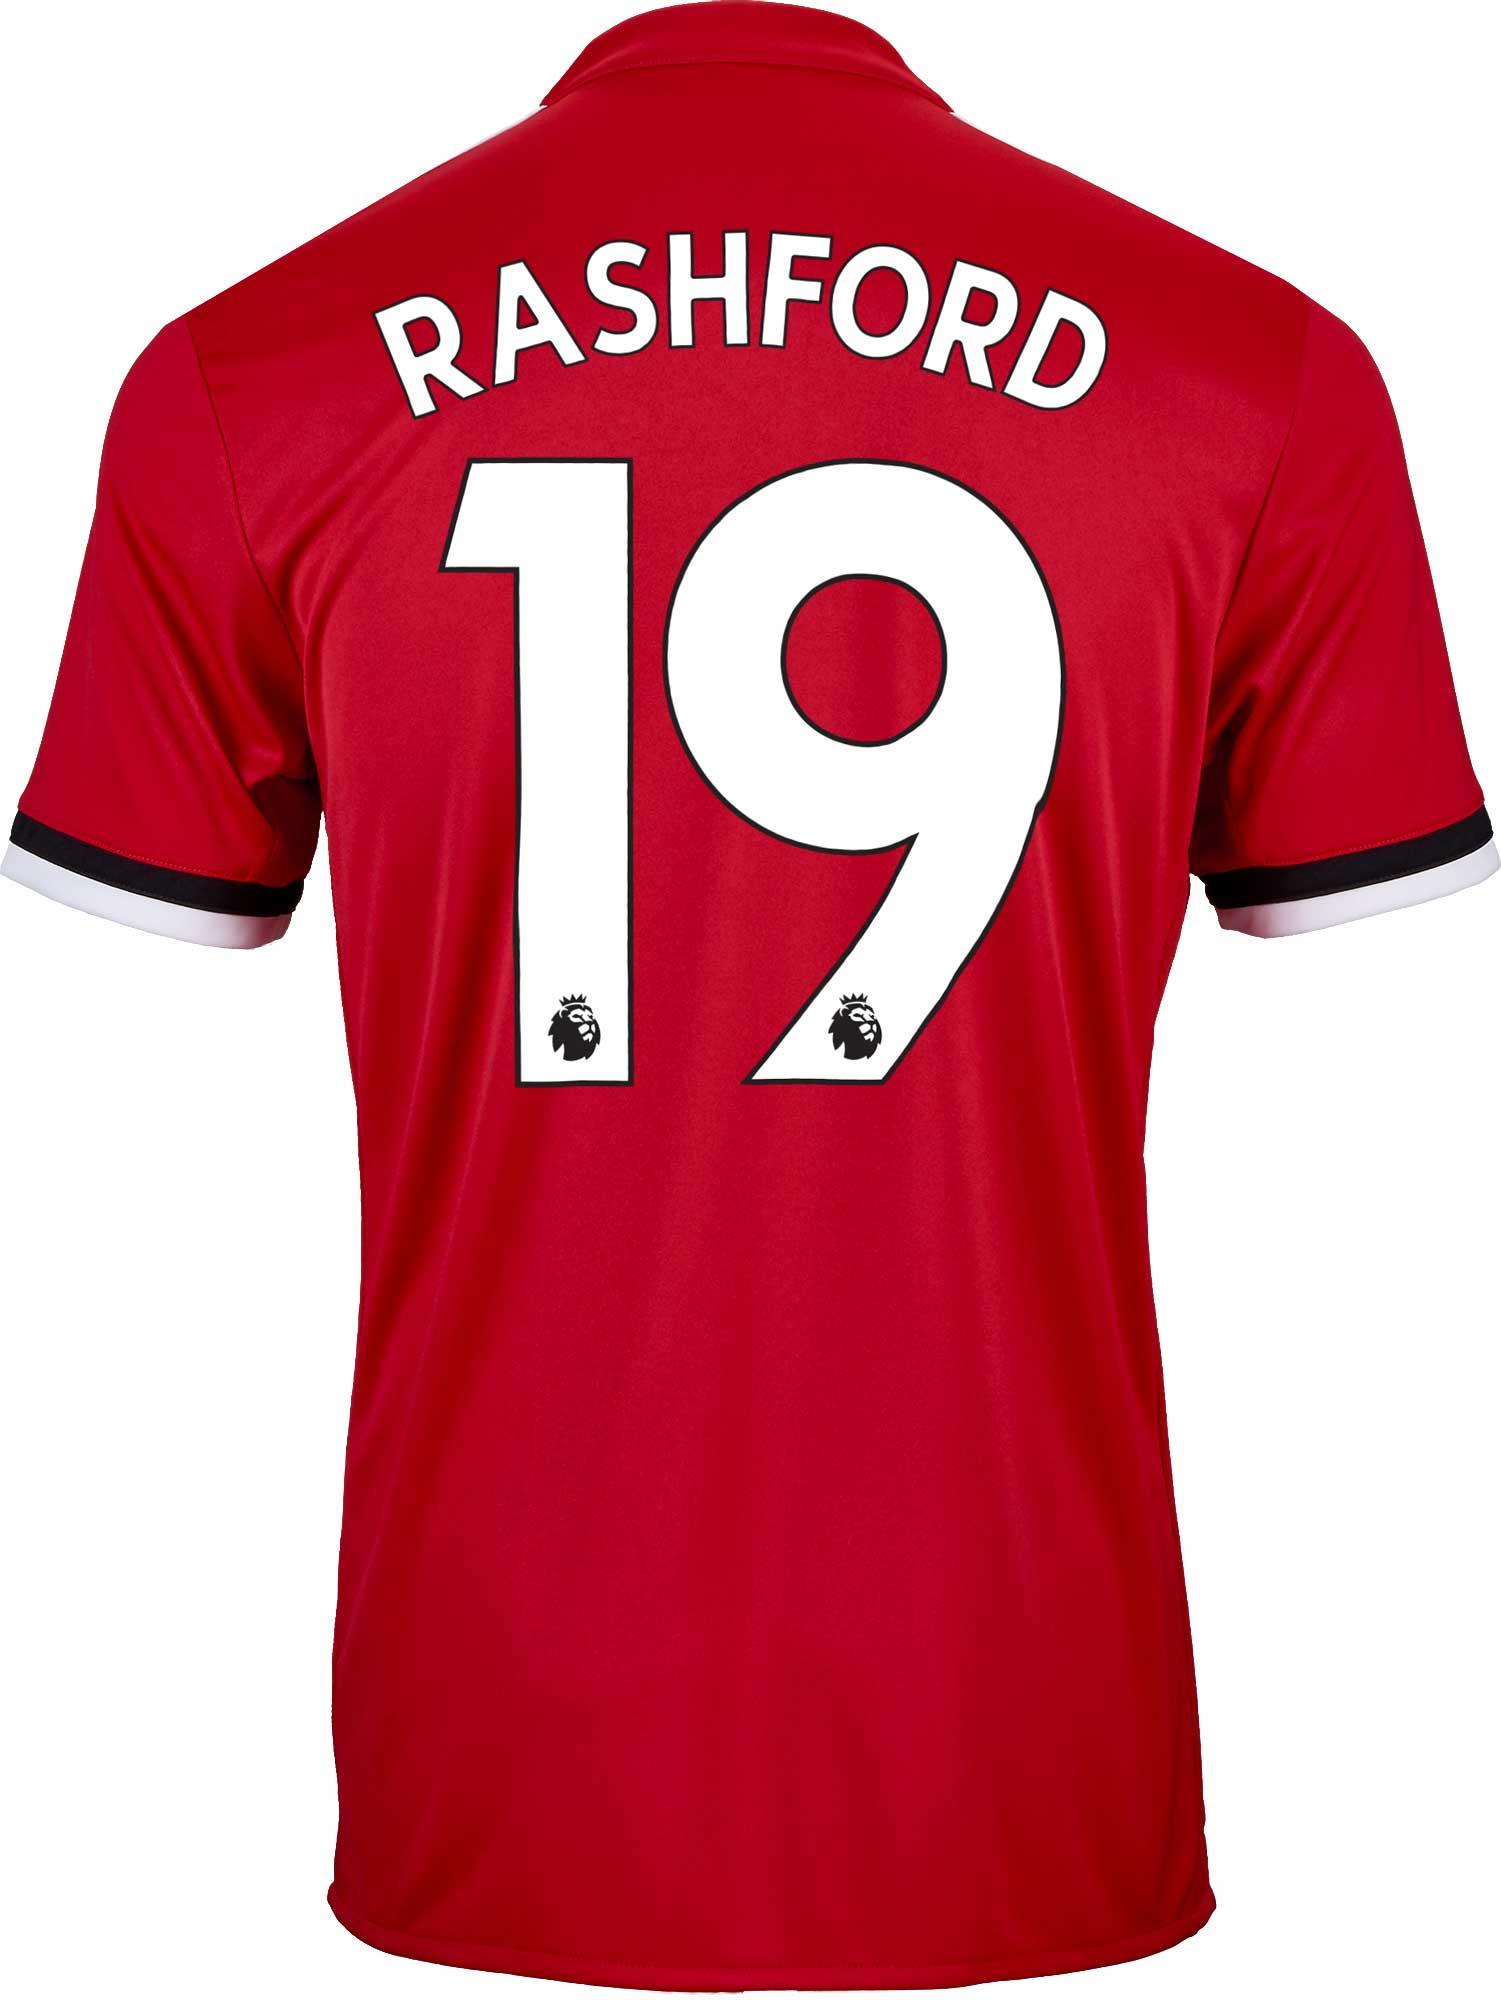 154582cf adidas Marcus Rashford Manchester United Home Jersey 2017-18 - SoccerPro